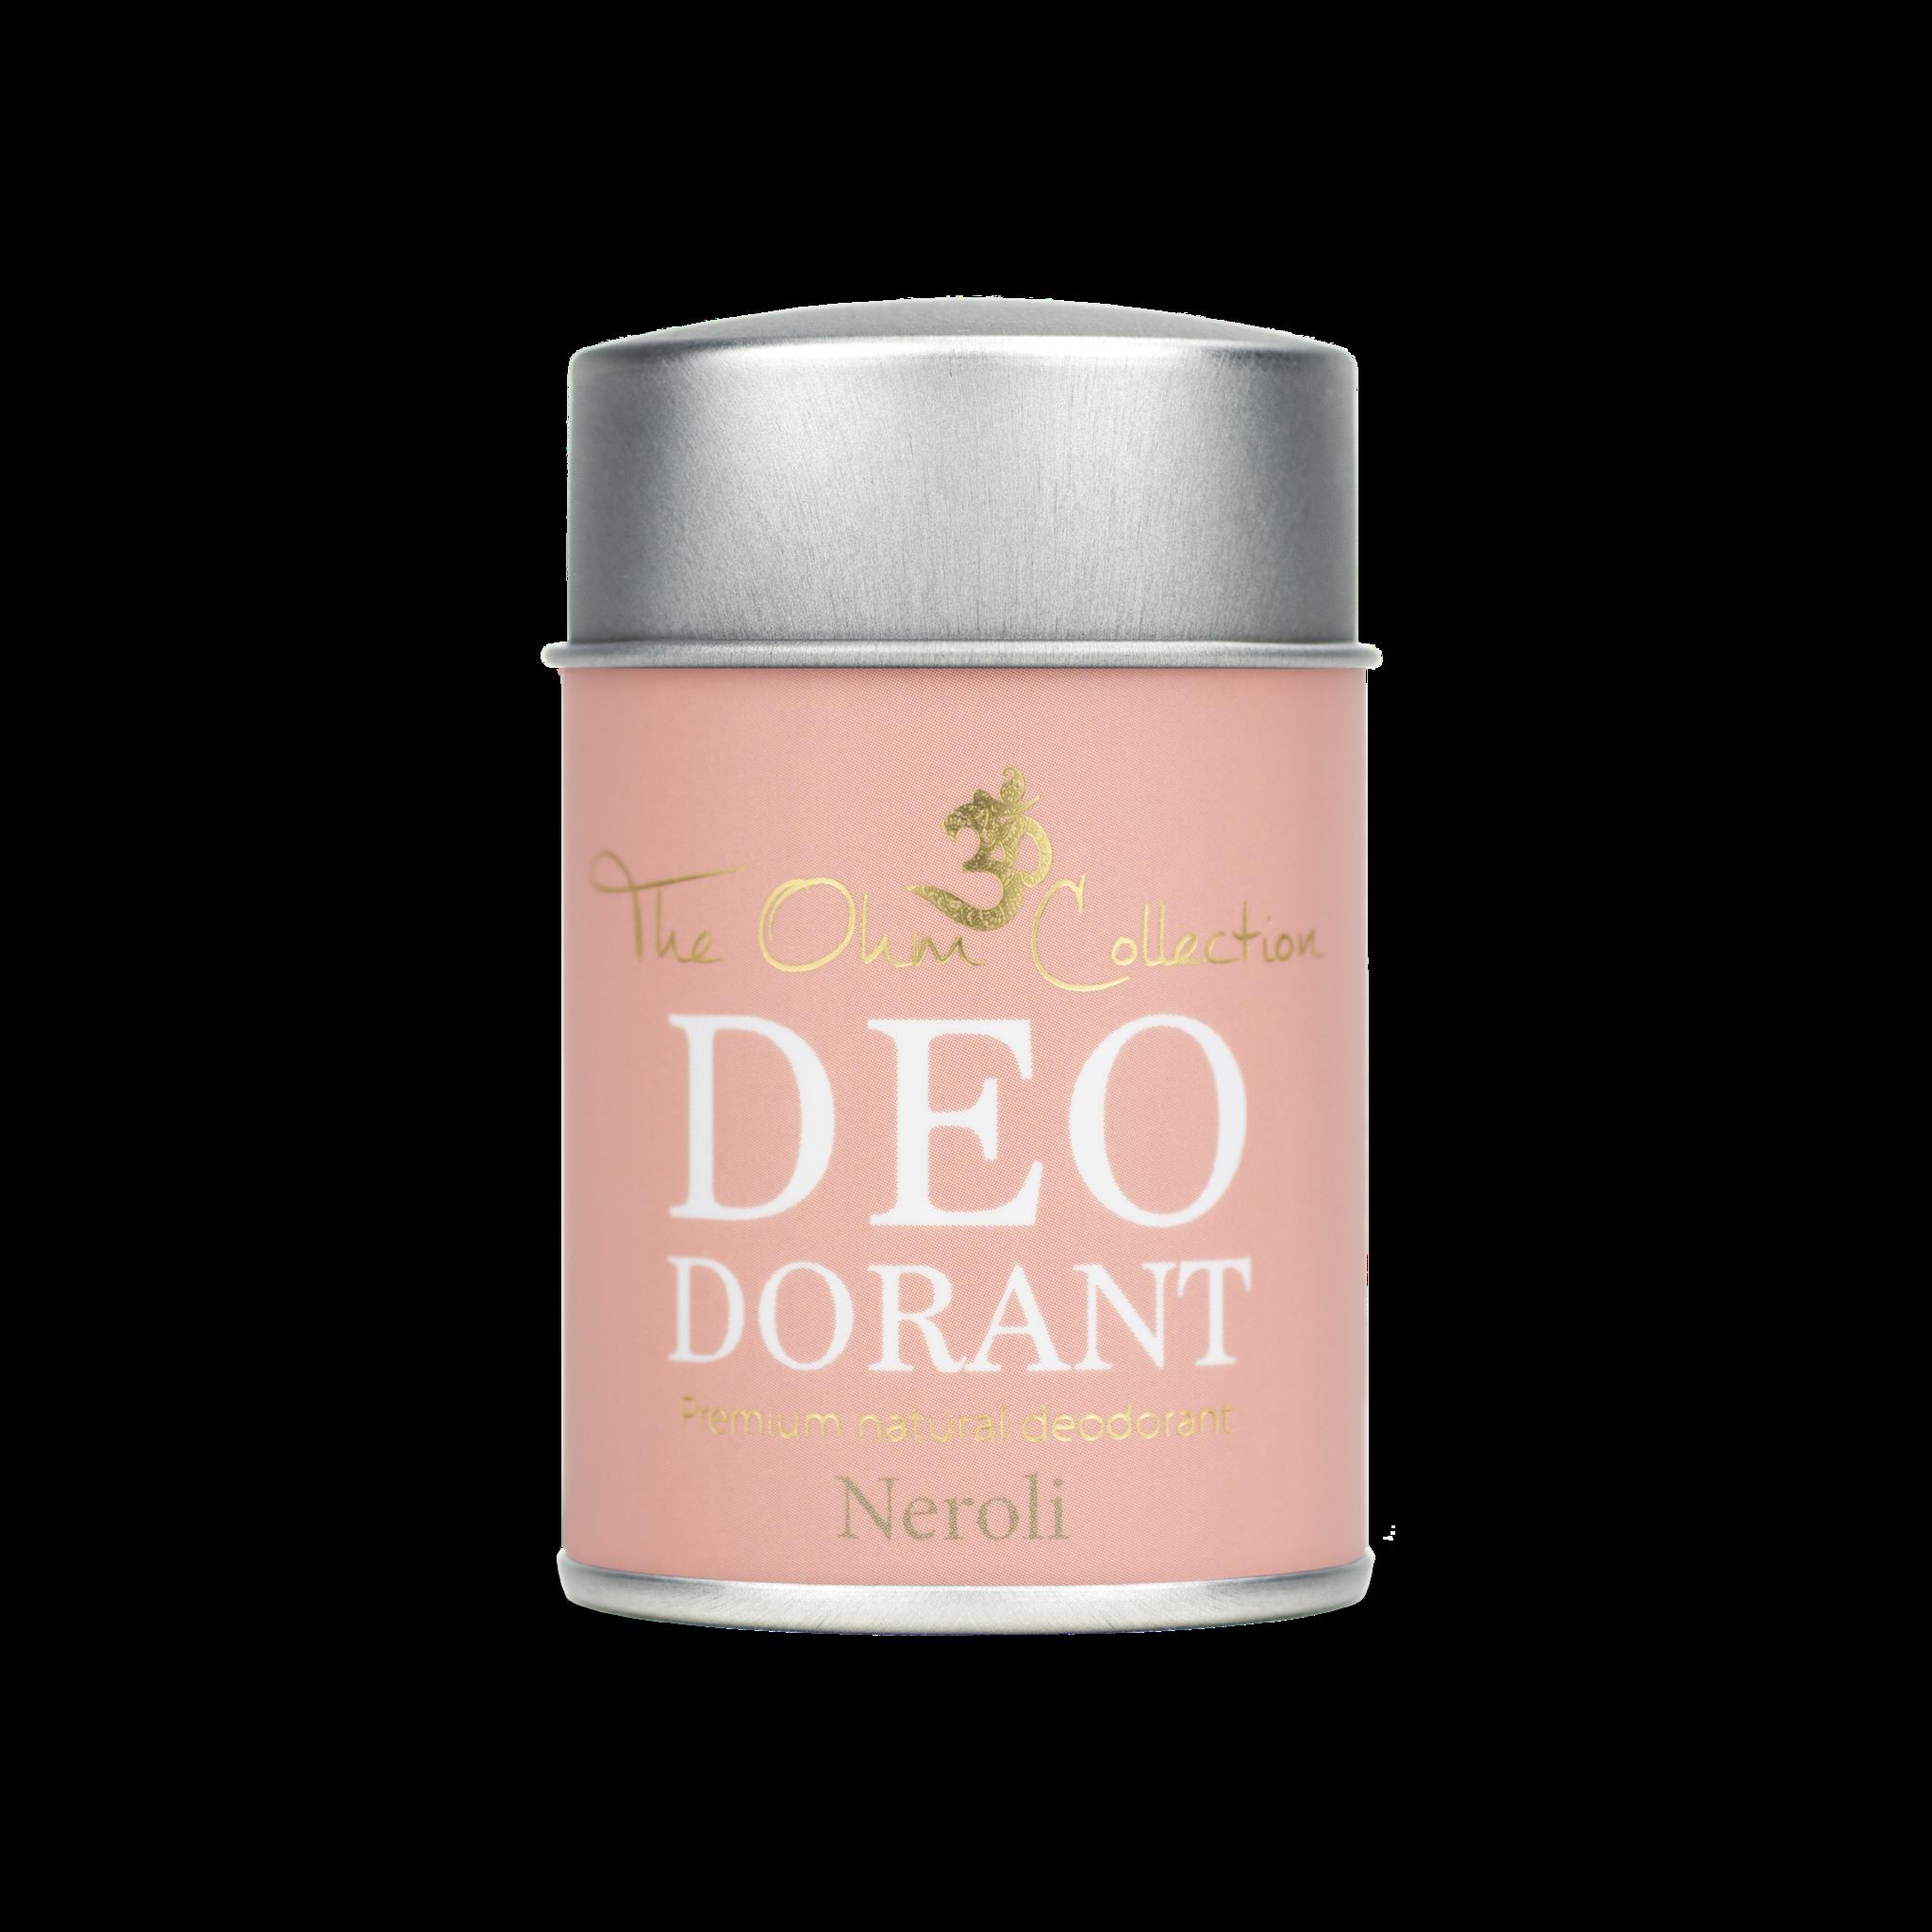 The Ohm Collection DEO Dorant Neroli 50 gr